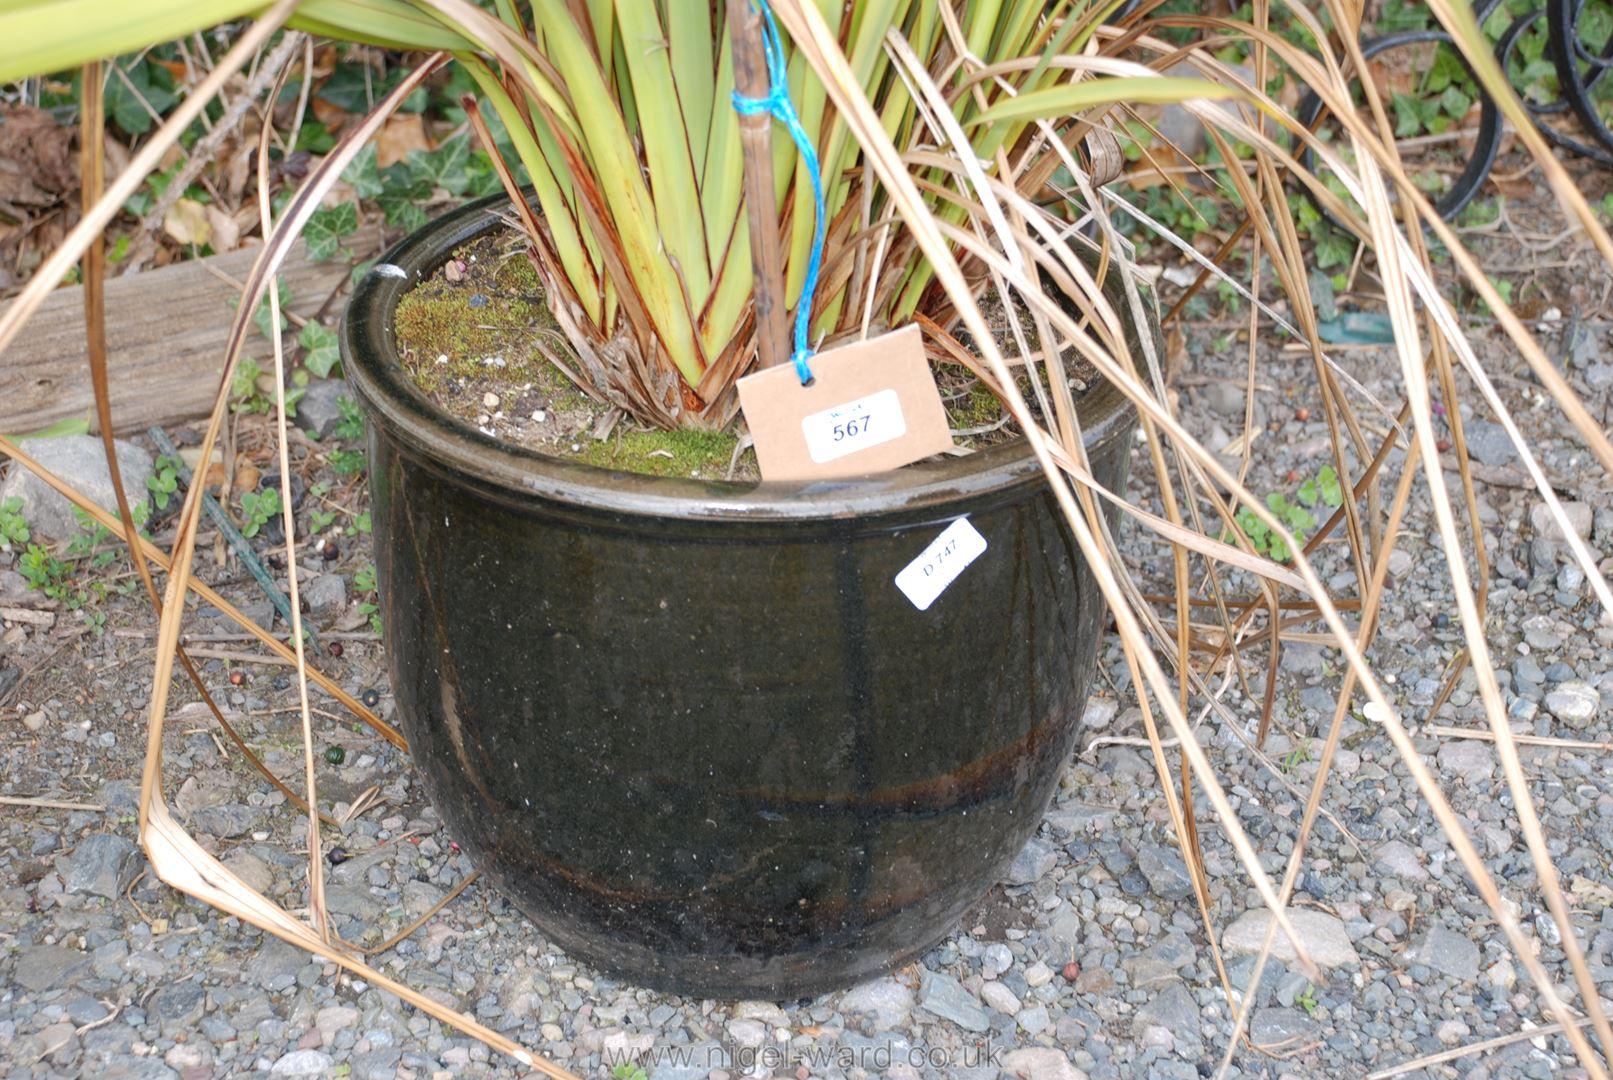 Glazed garden planter with Phormium Tenax shrub - Image 2 of 2